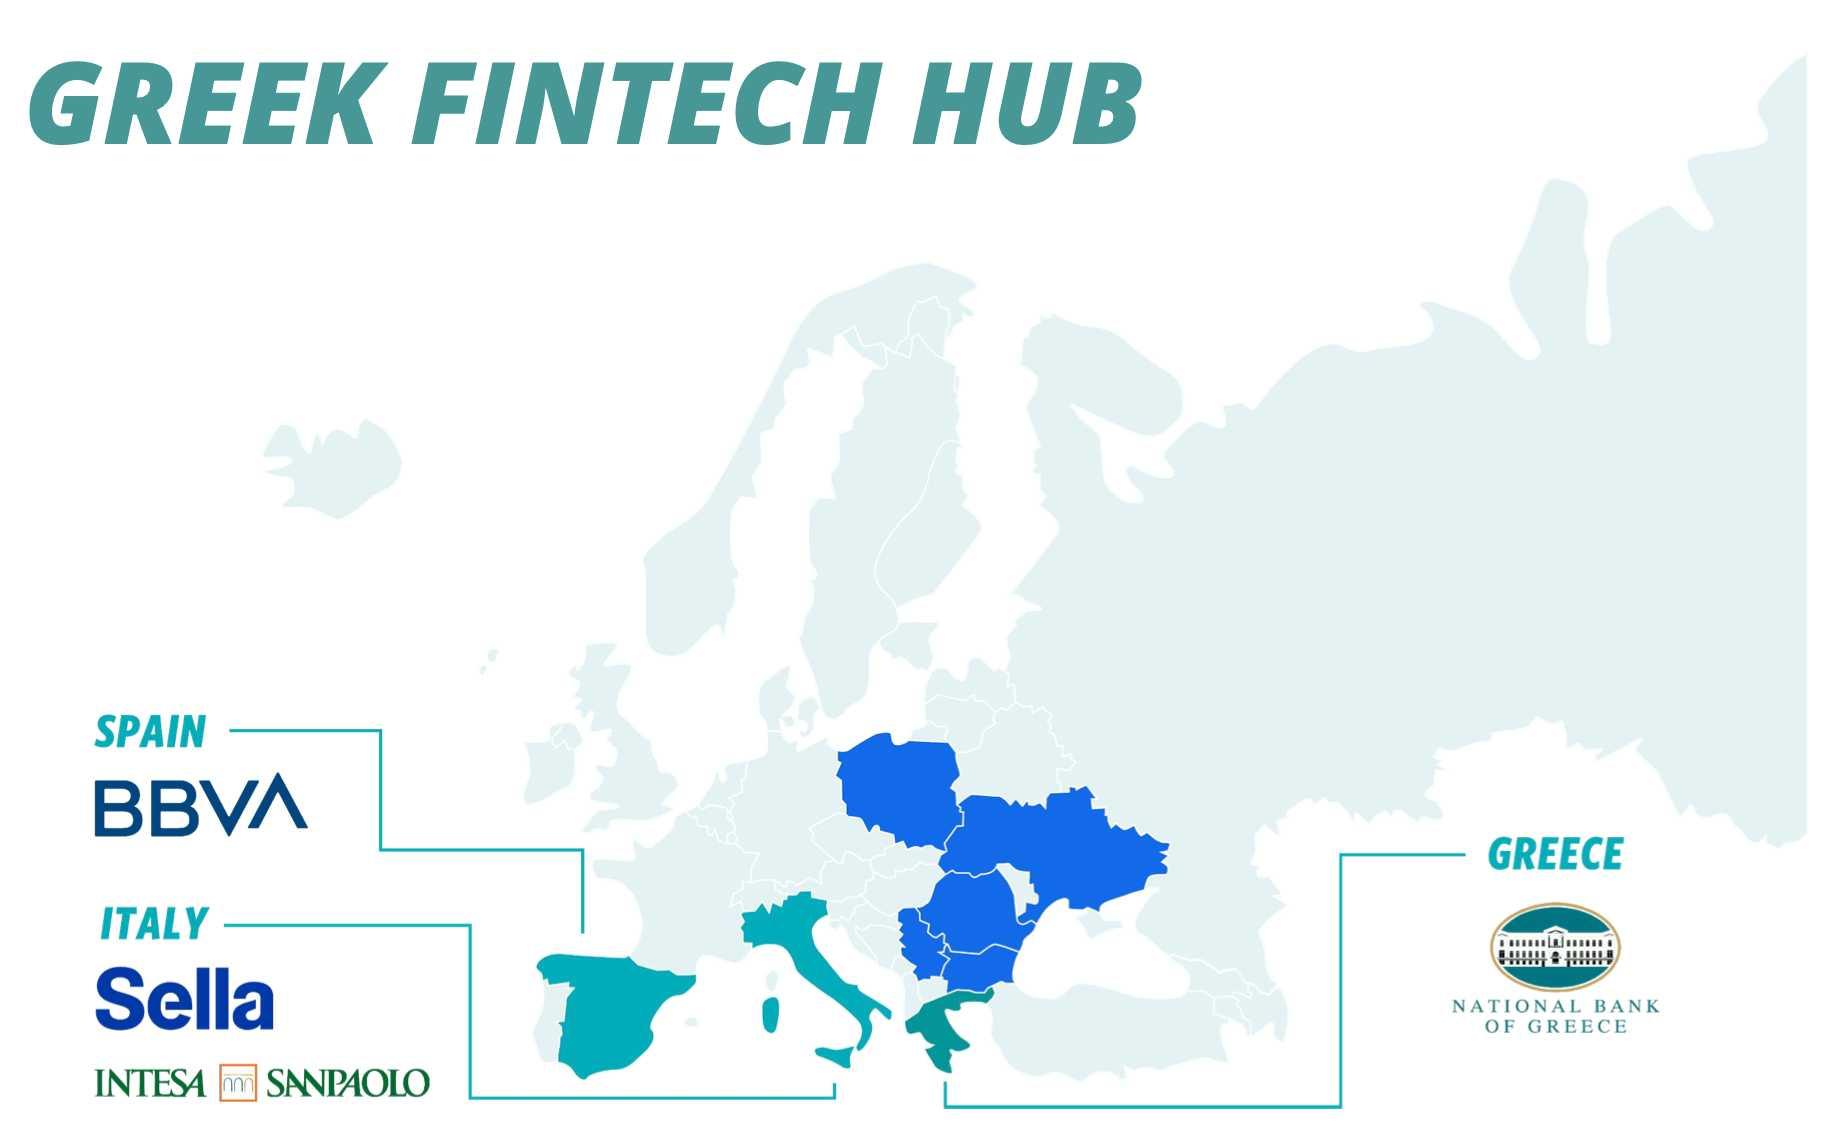 Greek Fintech Hub: Μια σημαντική πρωτοβουλία για το Fintech στην Ελλάδα και τις αναπτυσσόμενες οικονομίες της ΝΑ Ευρώπης